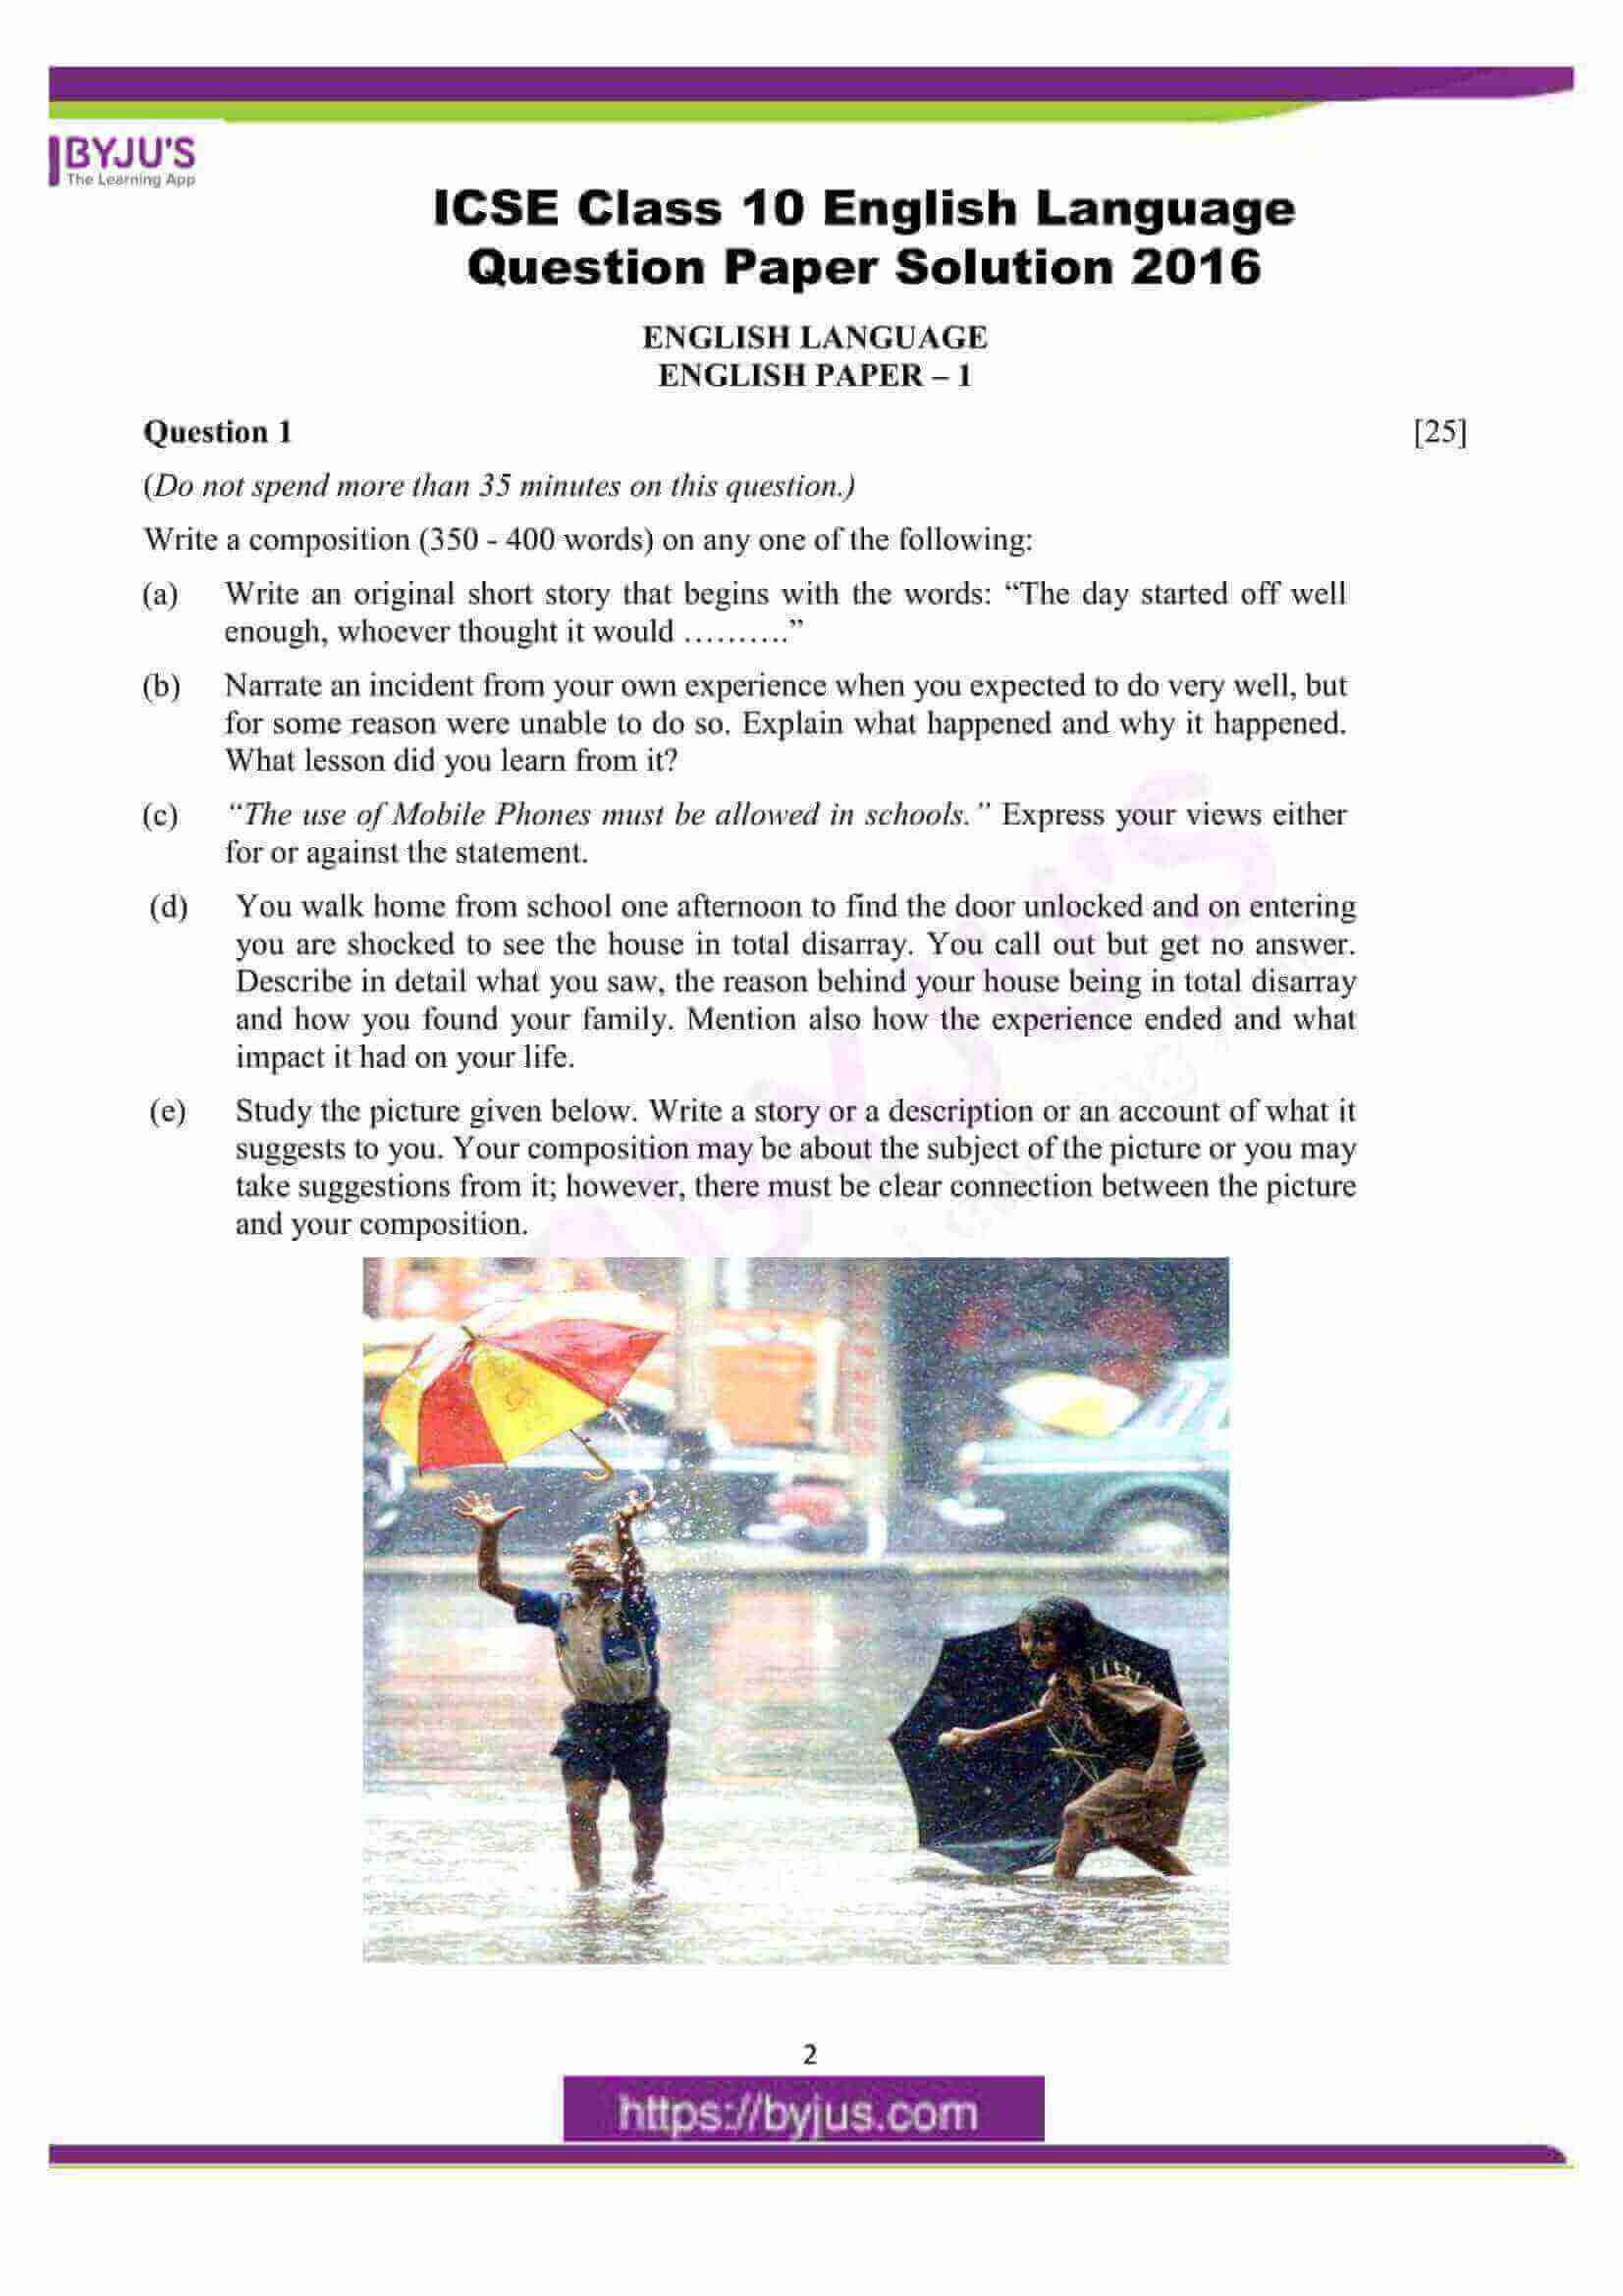 icse class 10 eng lan question paper solution 2016 01